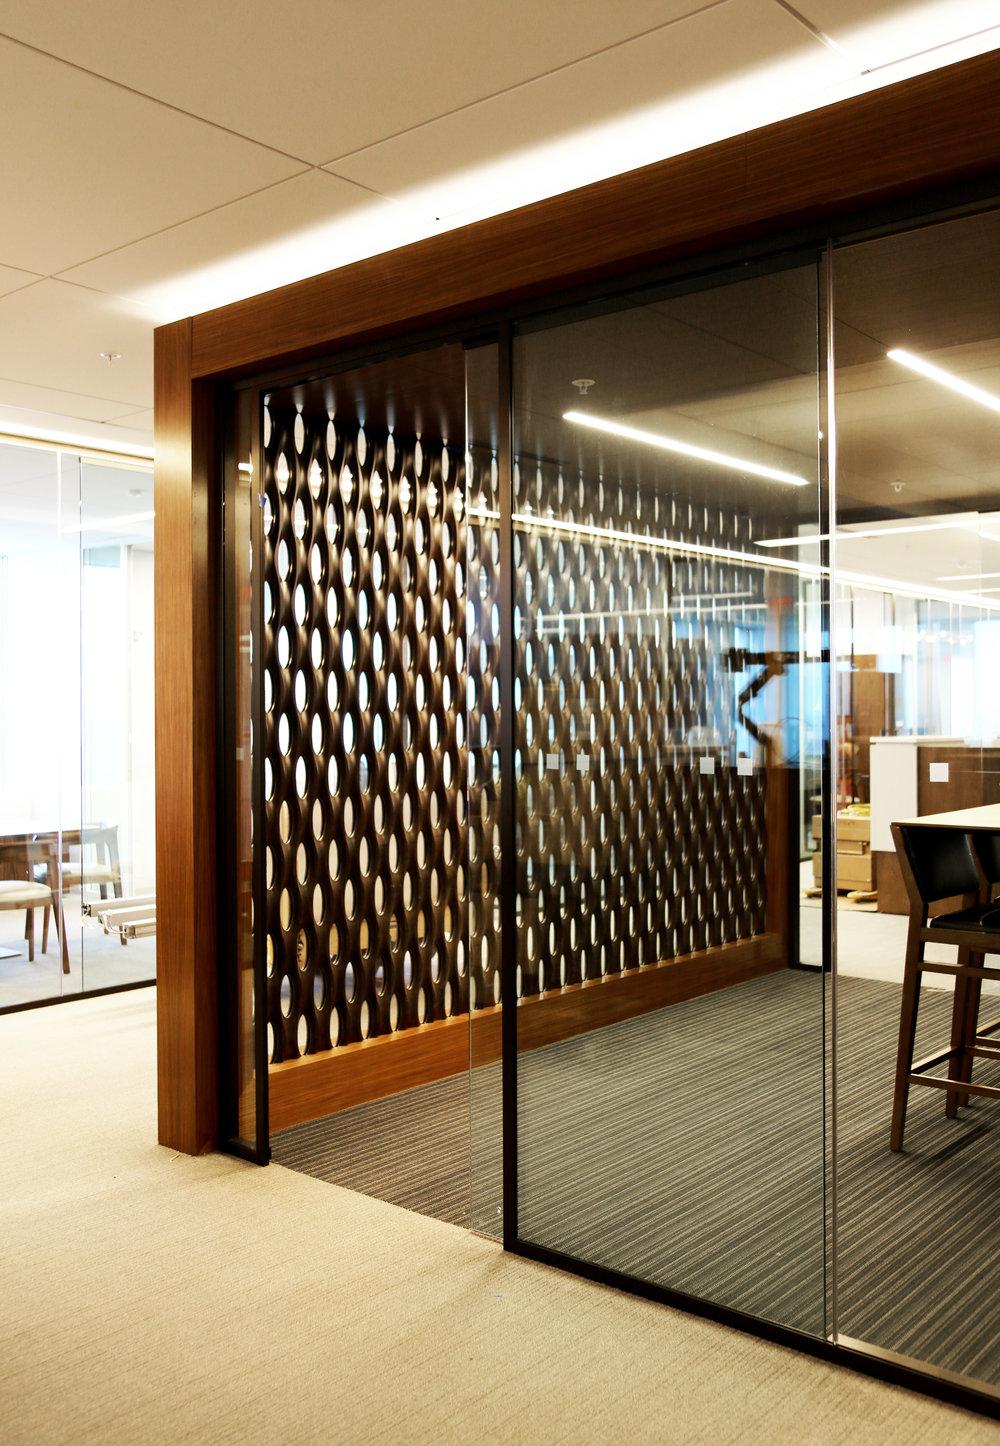 Modernus Glass Millwork Conference Area - Spaceworks AI.jpg